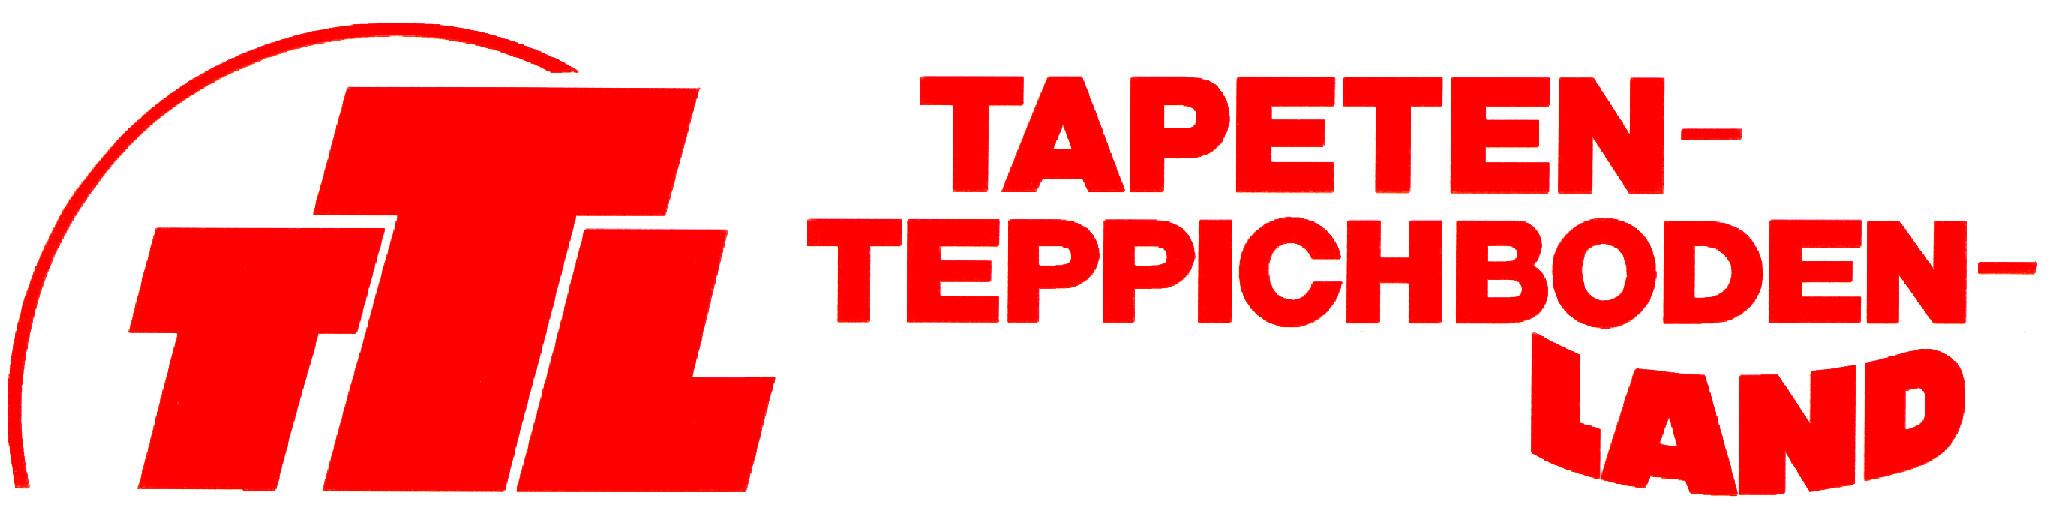 Logo: TTL Tapeten-Teppichboden-Land Rastatt (während des Lockdowns geschlossen)